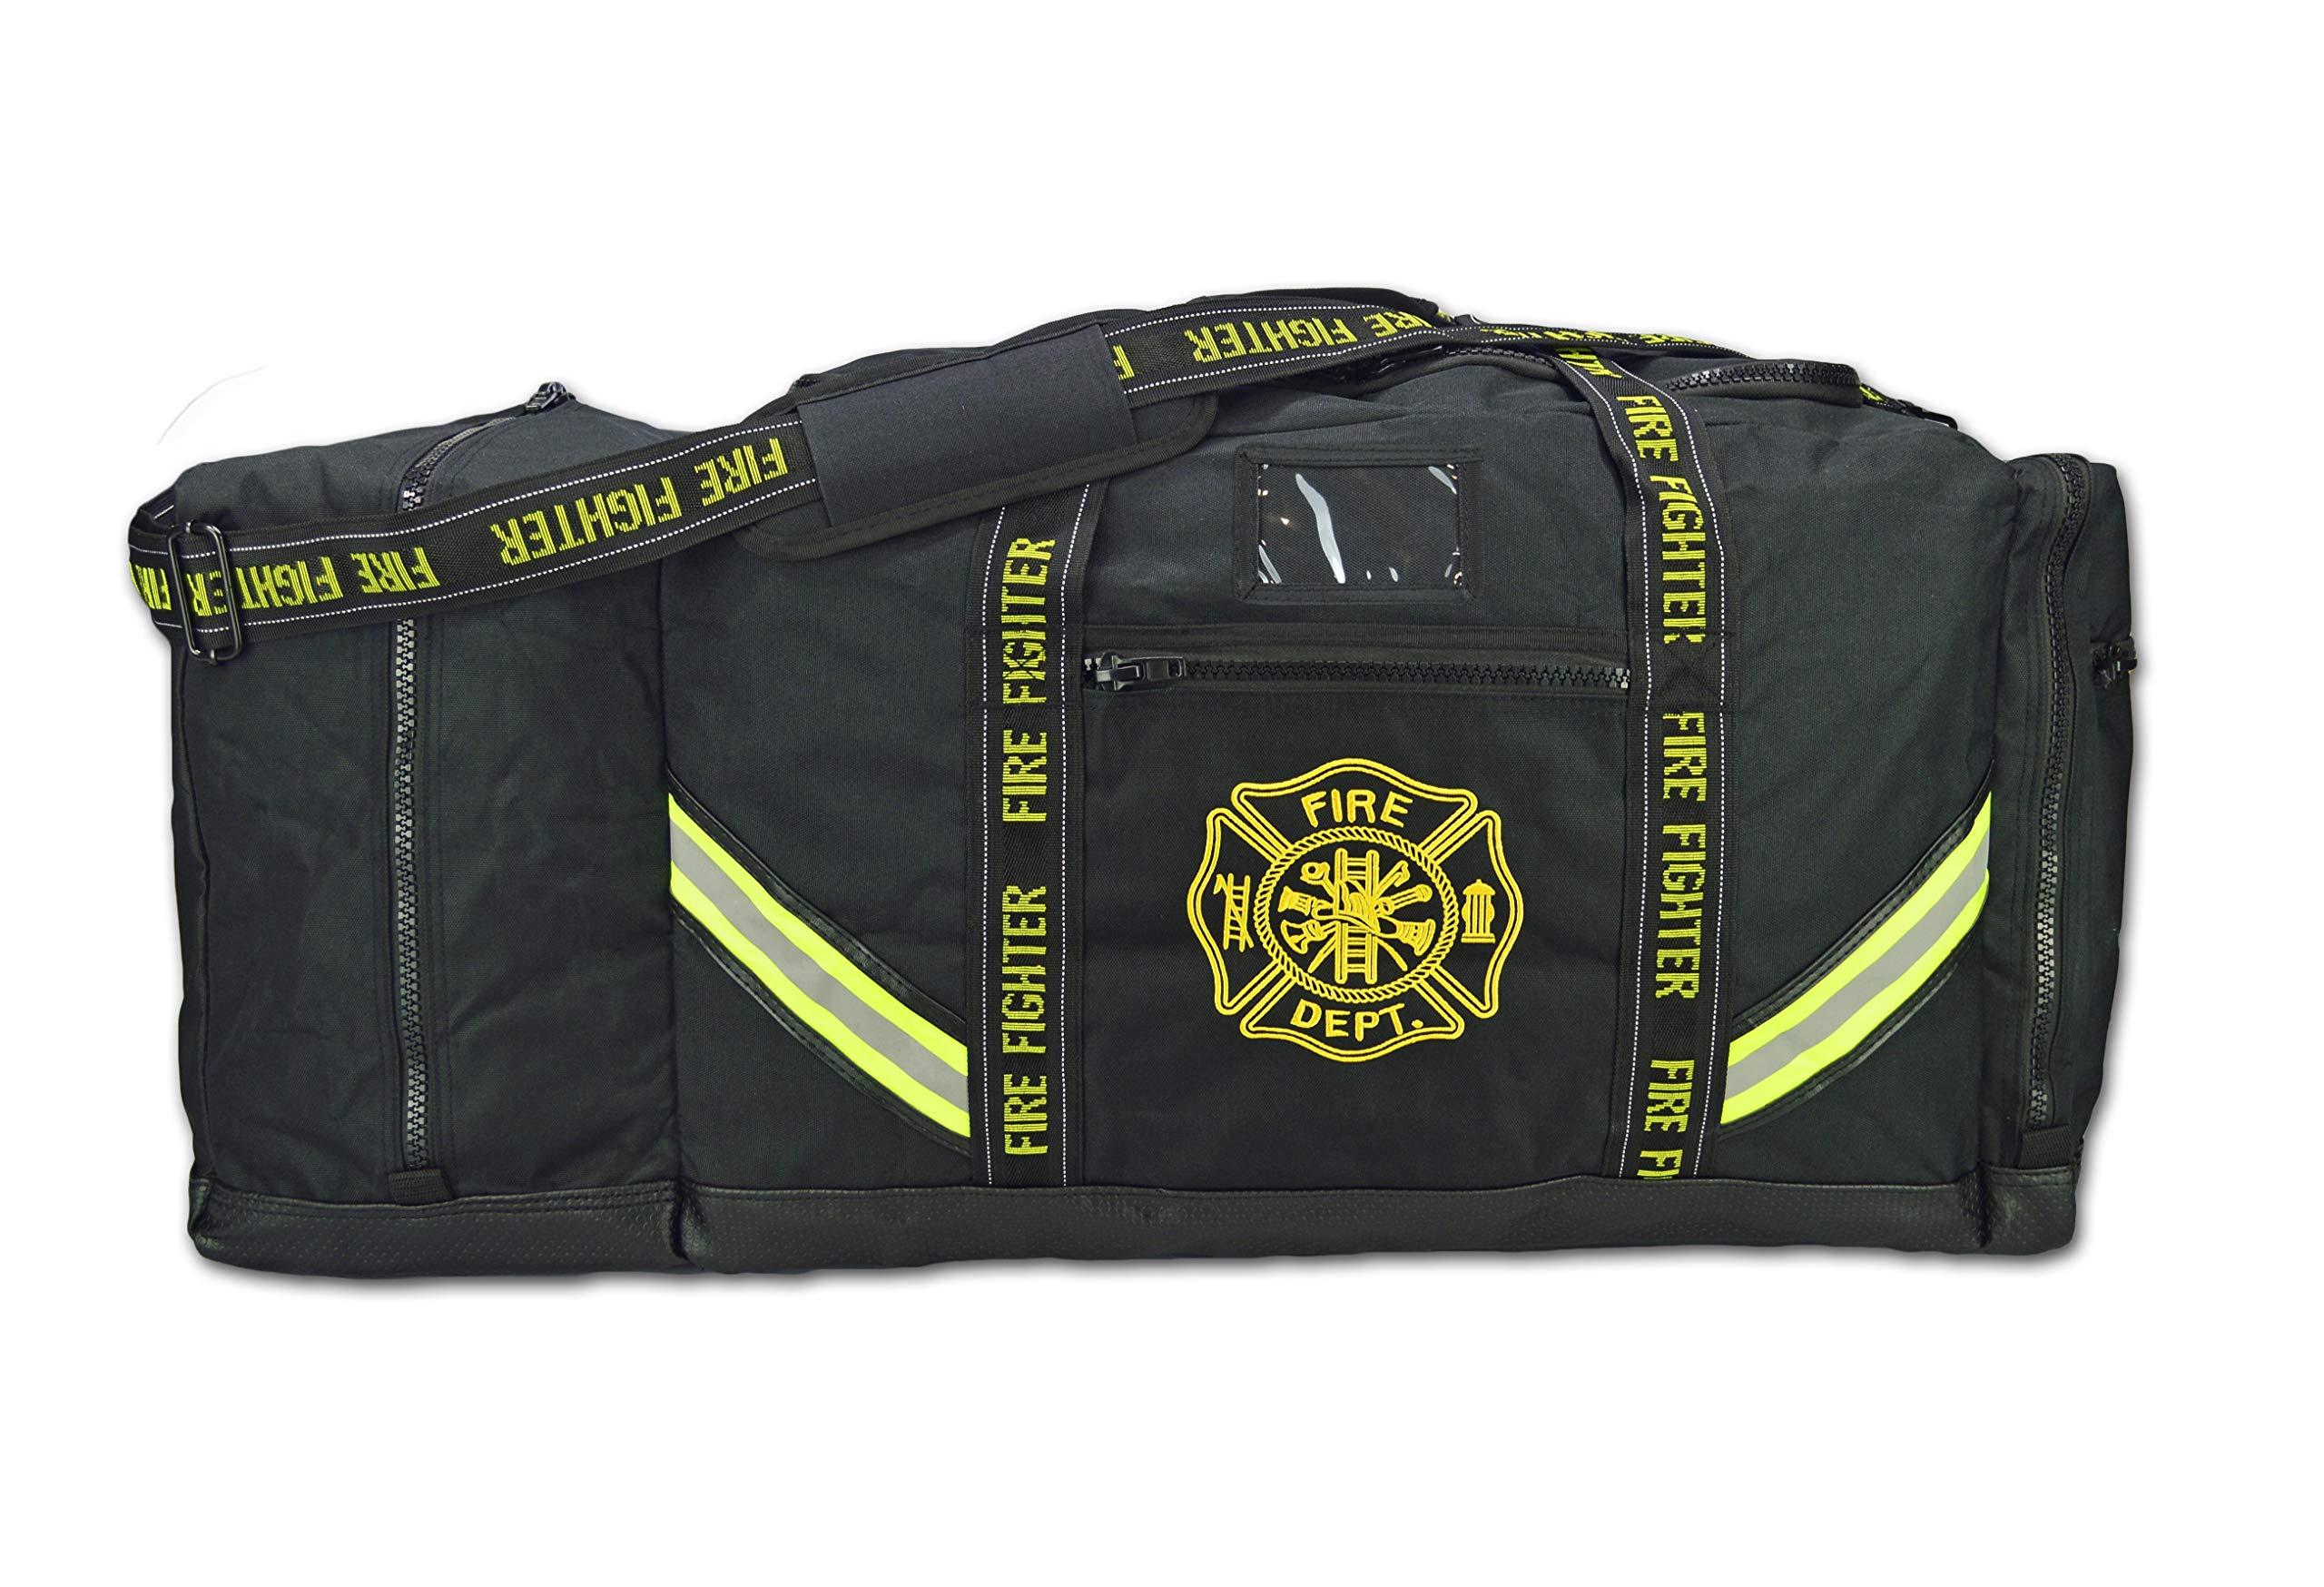 Lightning X Fireman Premium 3XL Firefighter Rescue Step-In Turnout Fire Gear Bag w/Shoulder Strap & Helmet Pocket (Black)